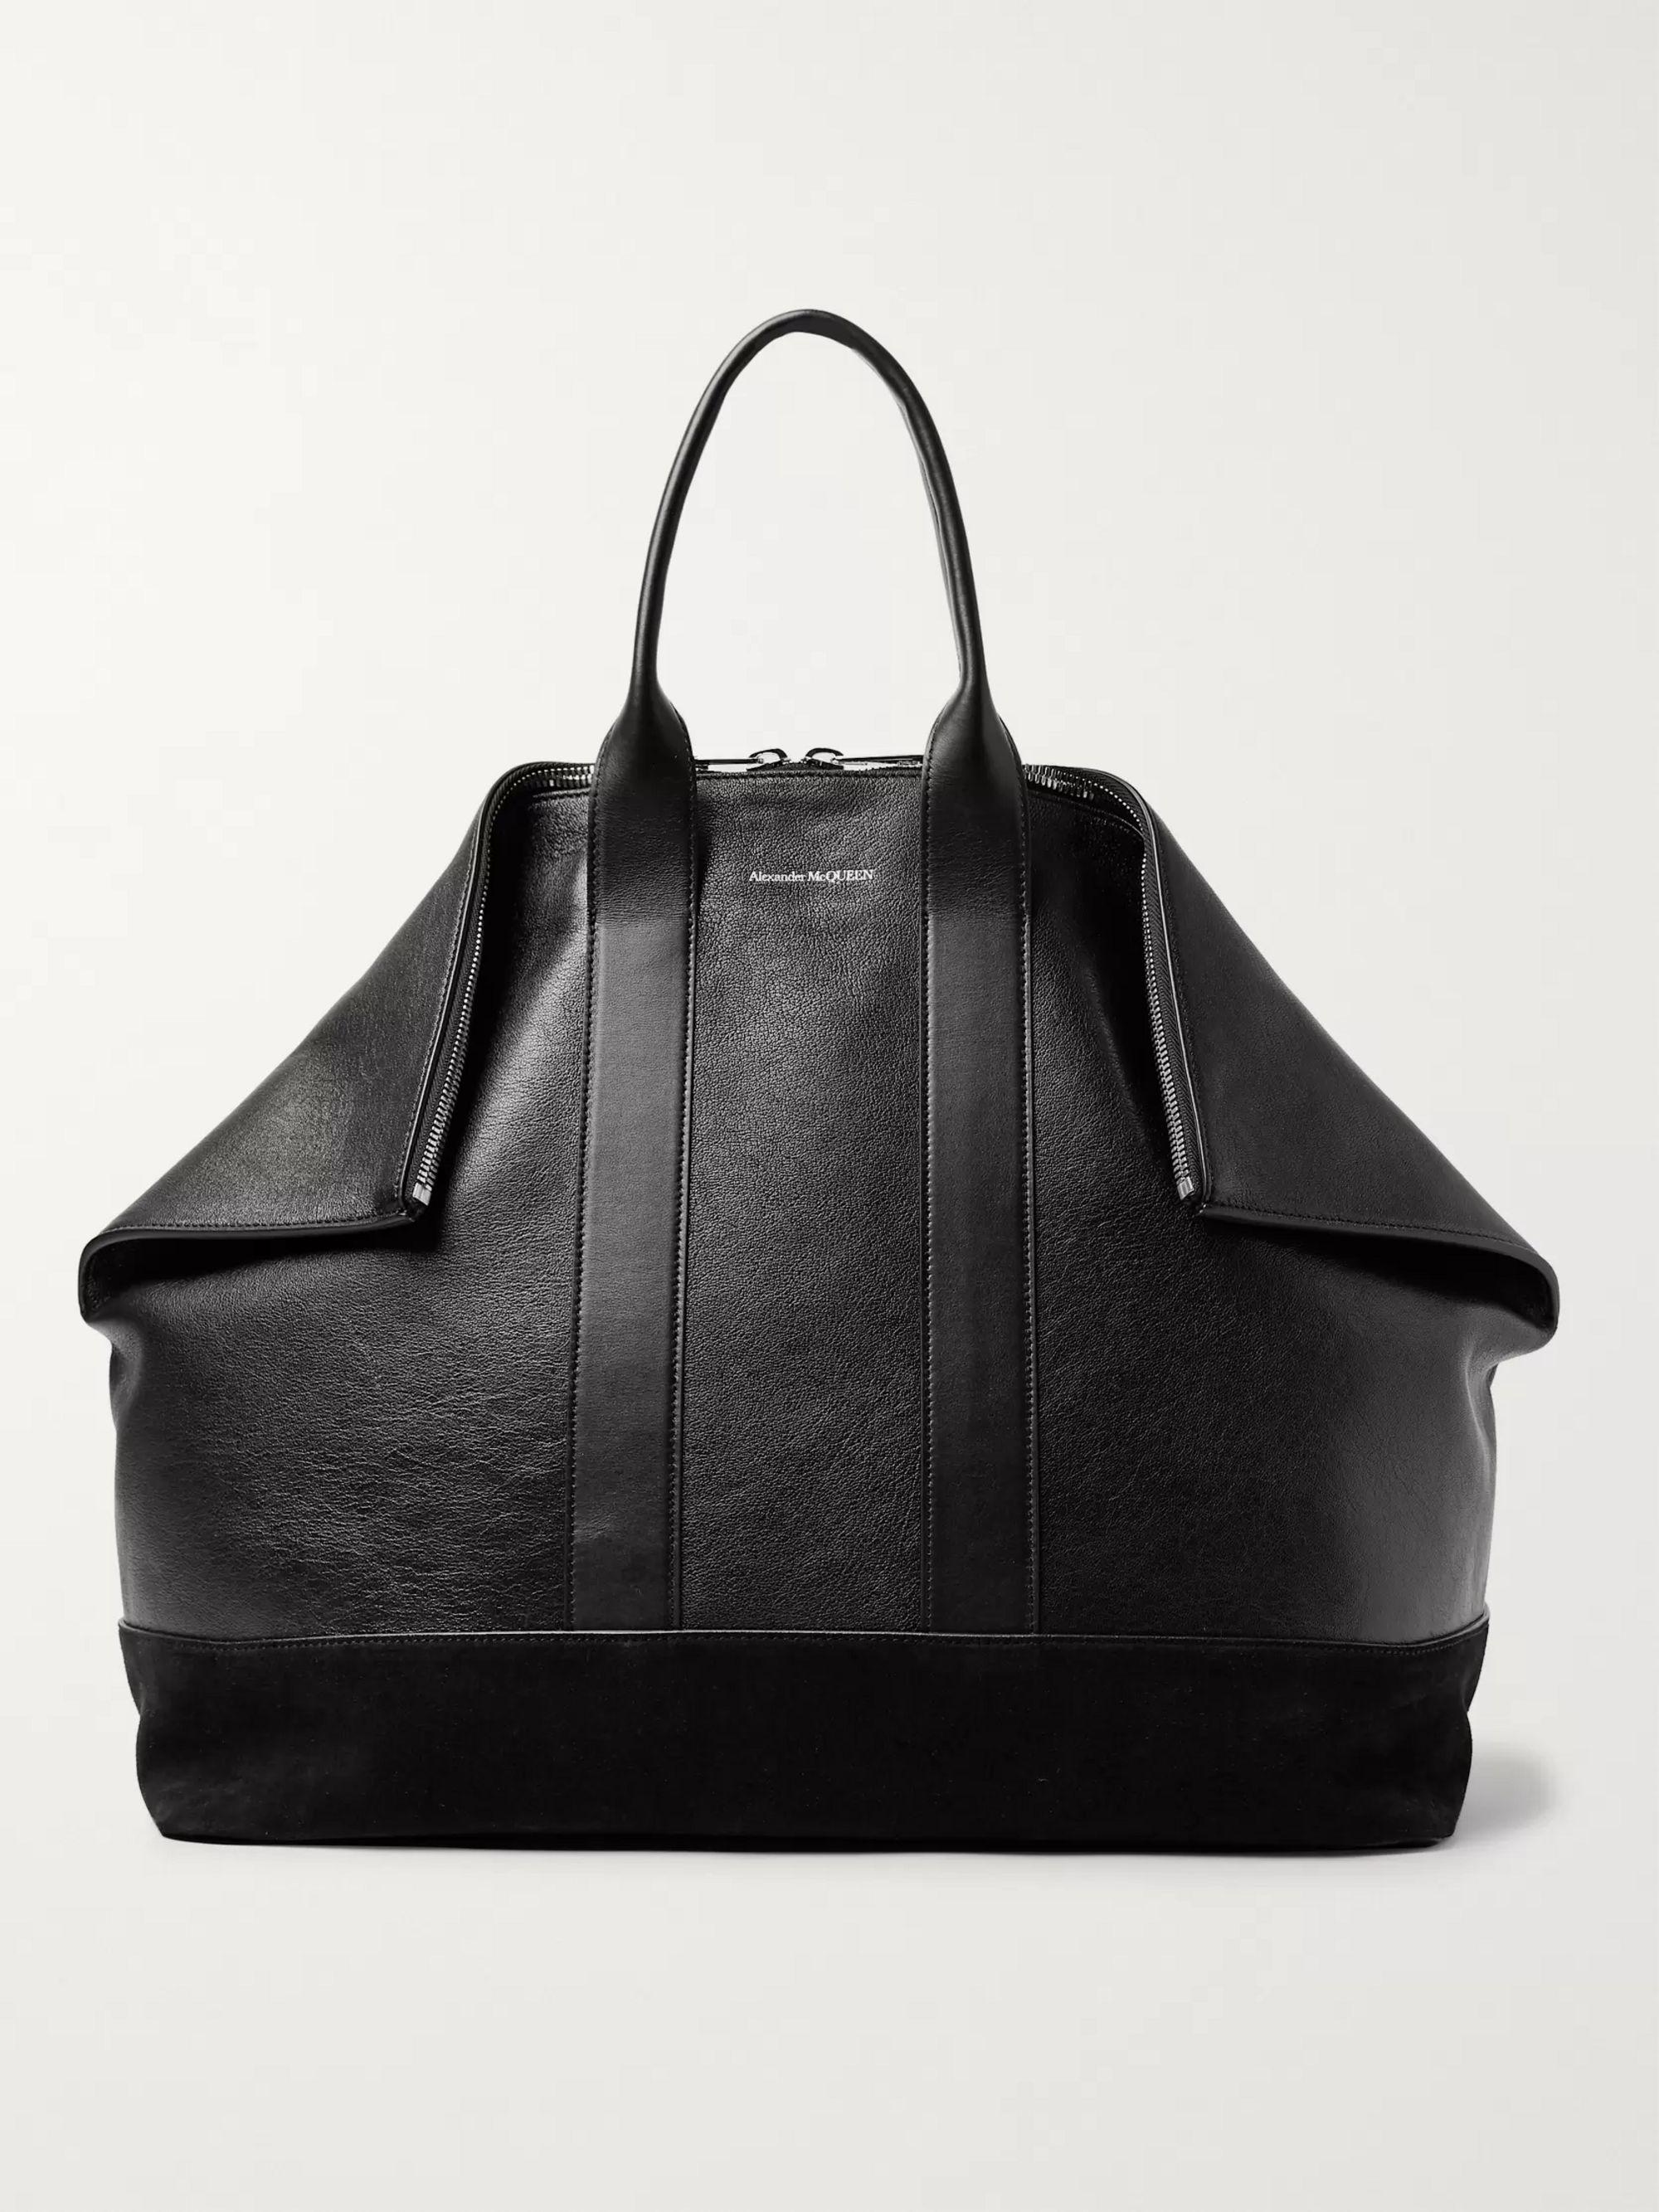 De Manta Leather And Suede Tote Bag